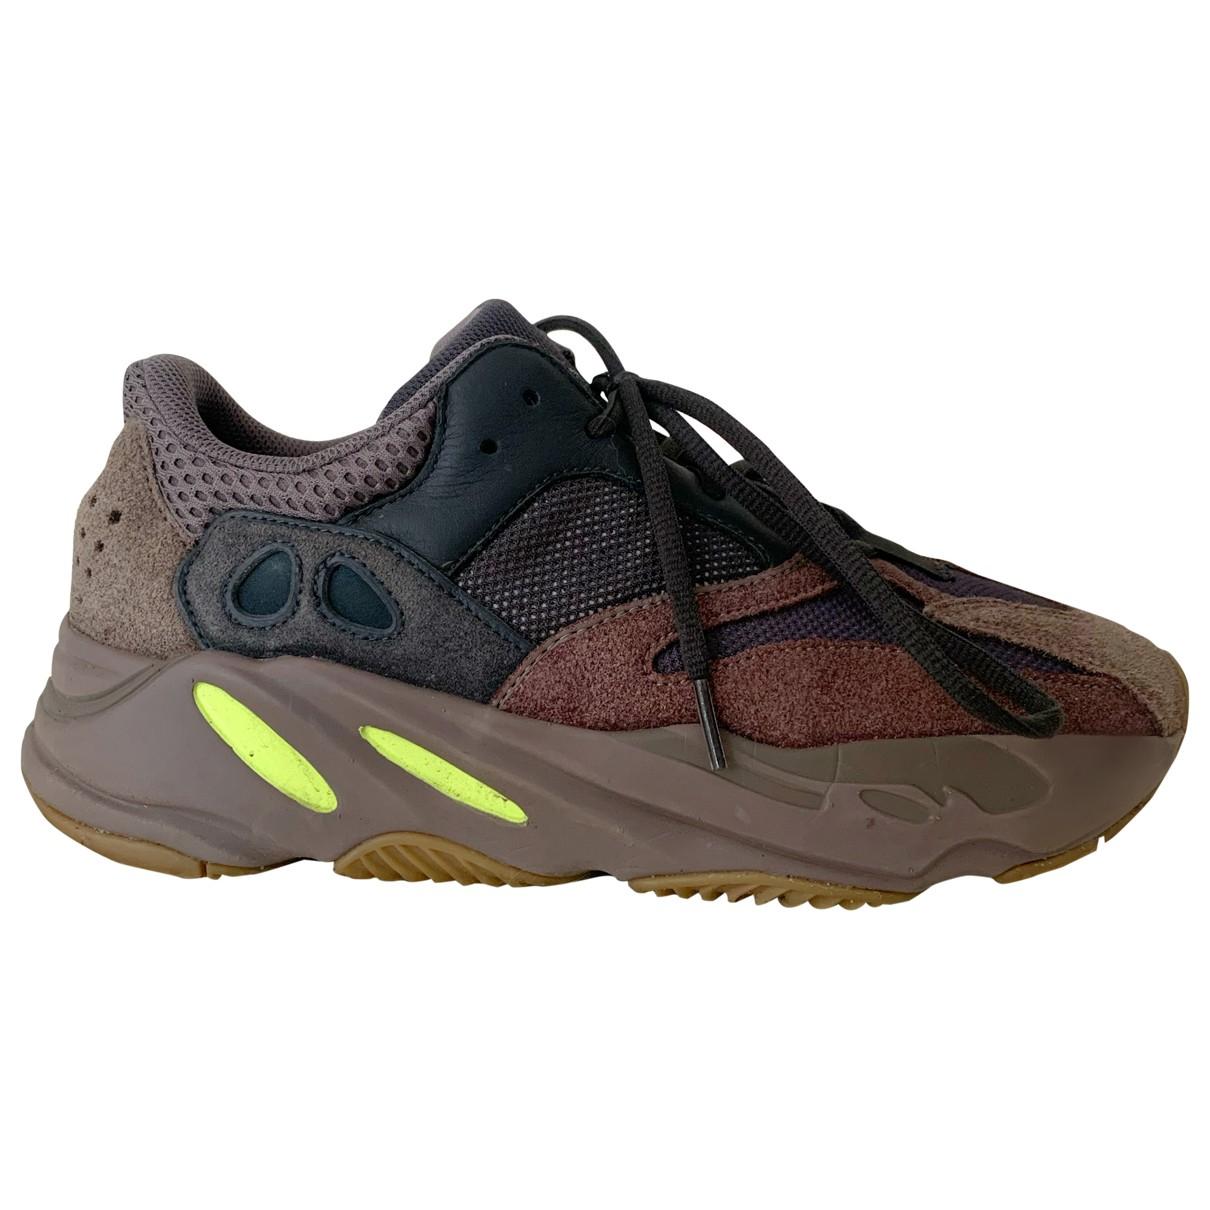 Yeezy X Adidas Boost 700 V1  Sneakers in  Braun Leinen